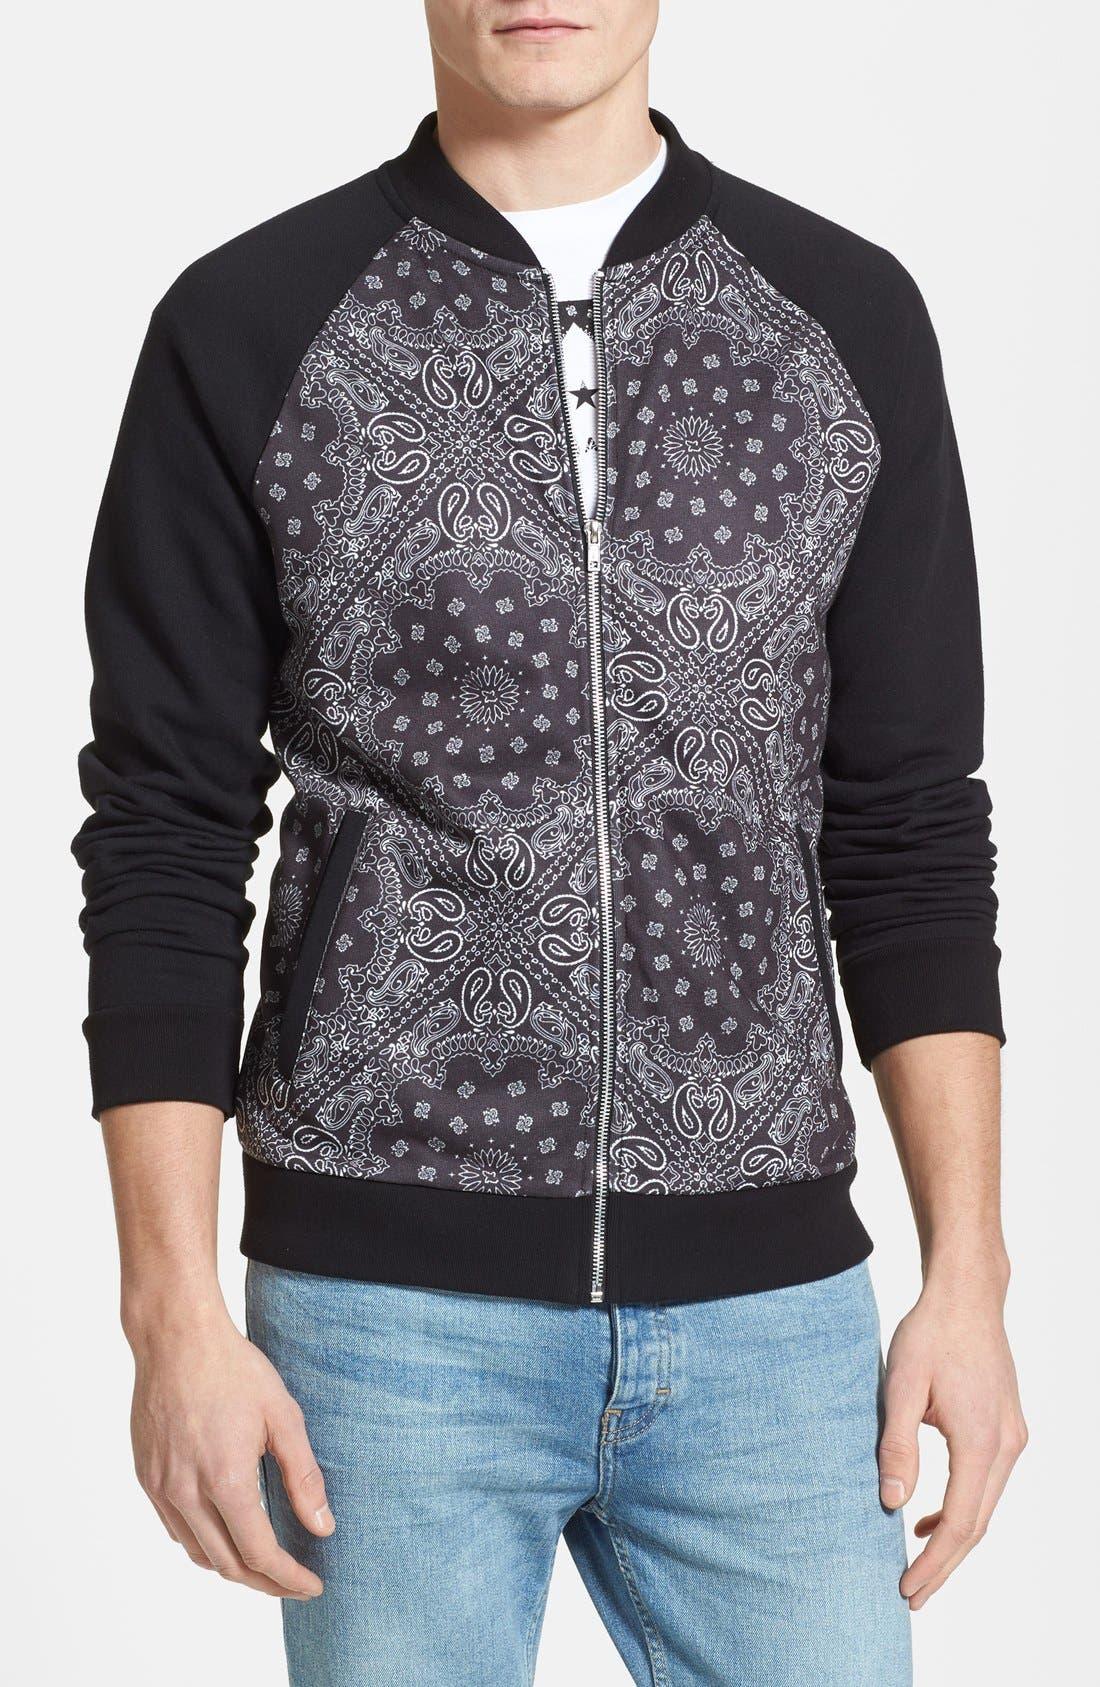 Main Image - Topman Bandana Print Jersey Zip Sweatshirt